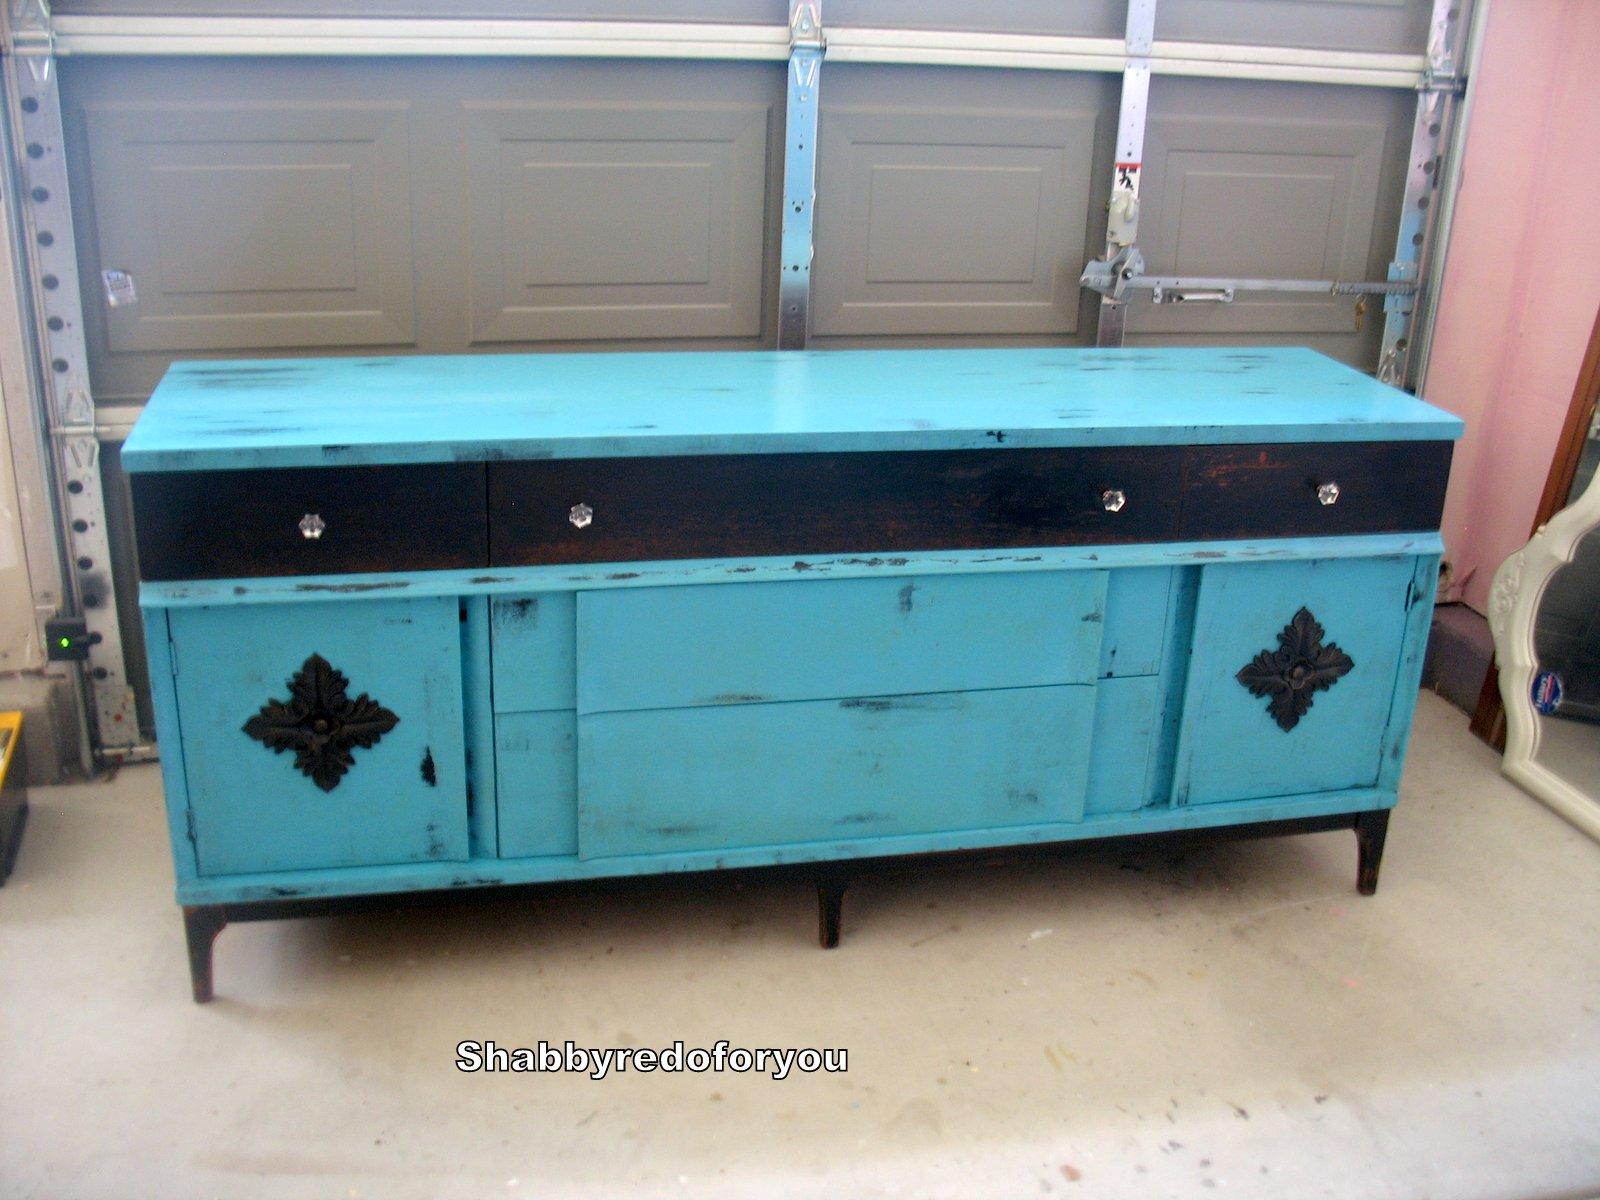 cadenza furniture. Cadenza Furniture. Shabby Vintage Buffet Or Redo In Aqua And Black Furniture